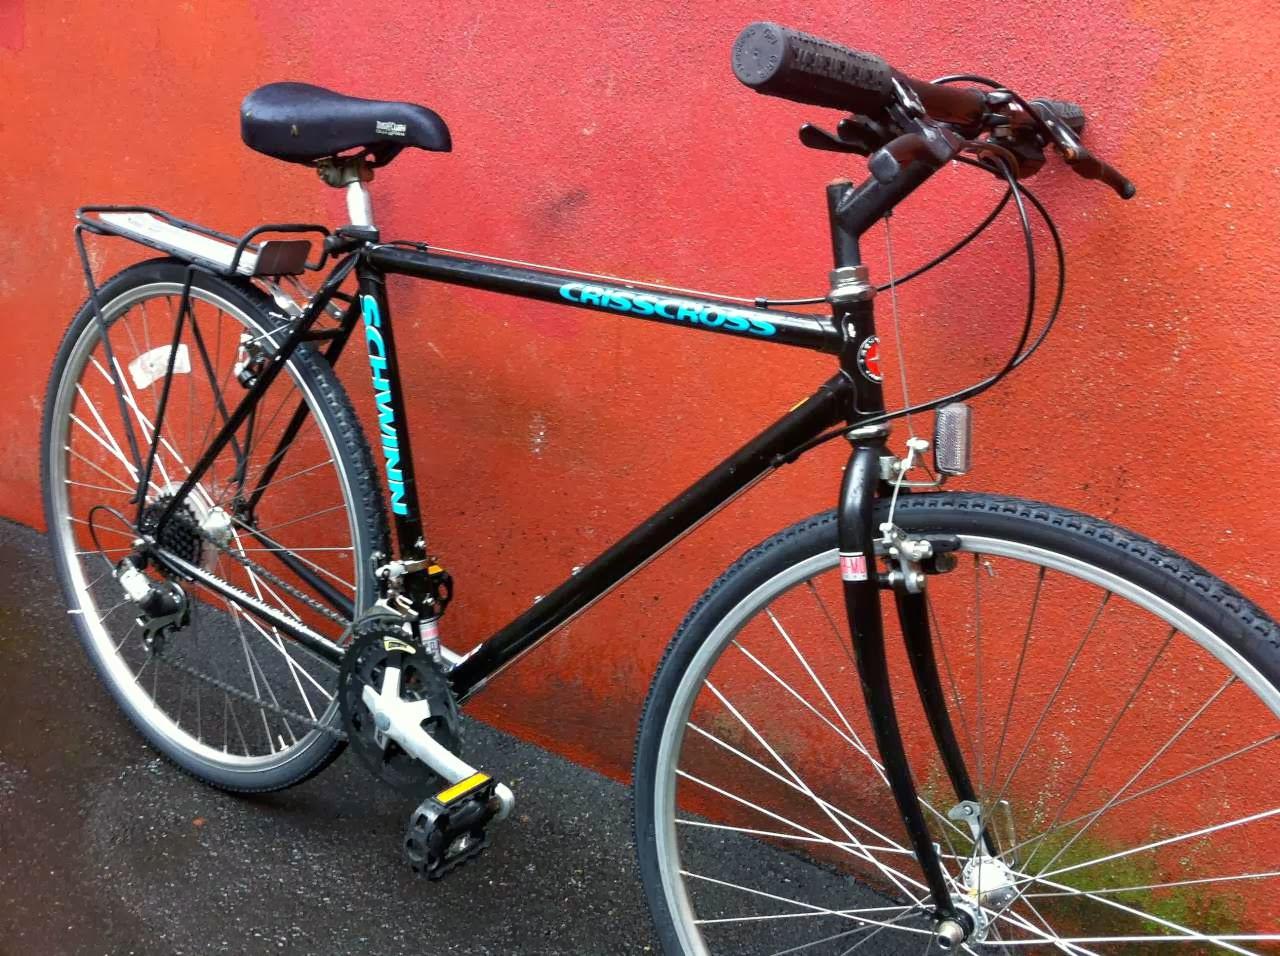 Bike Boom Refurbished Bikes 1991 Schwinn Criss Cross